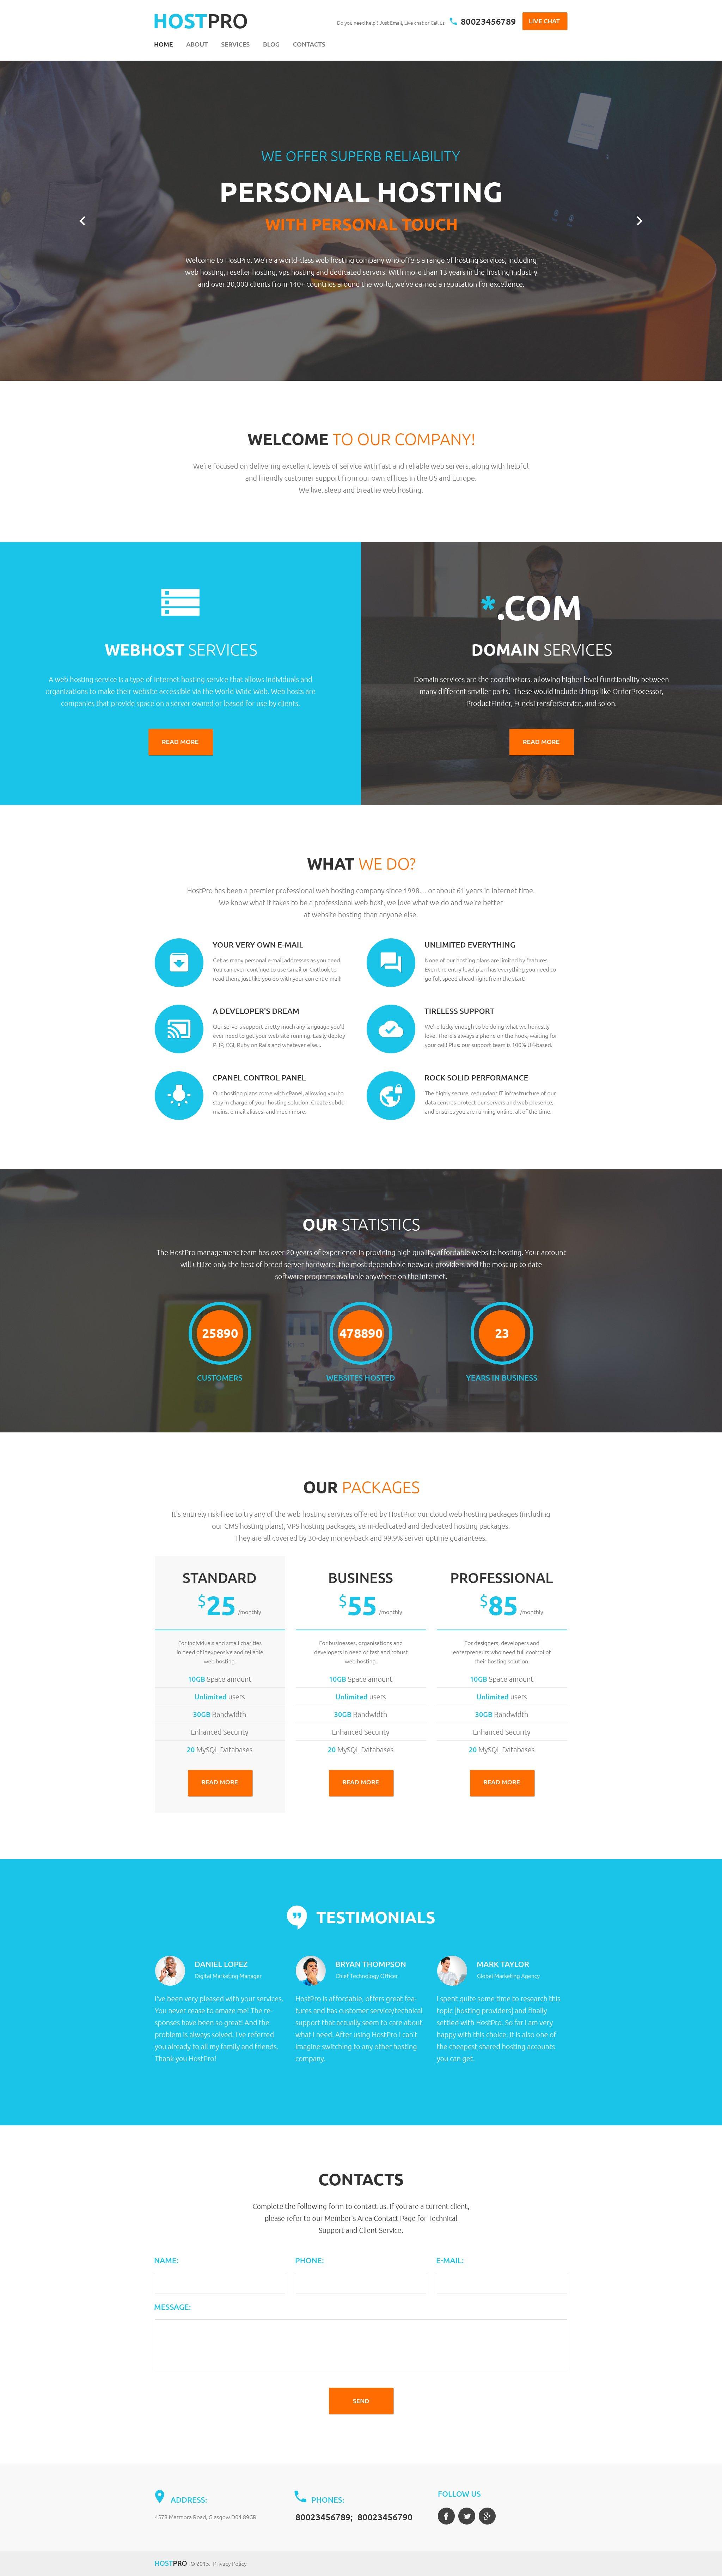 """HostPro"" - адаптивний WordPress шаблон №58537 - скріншот"